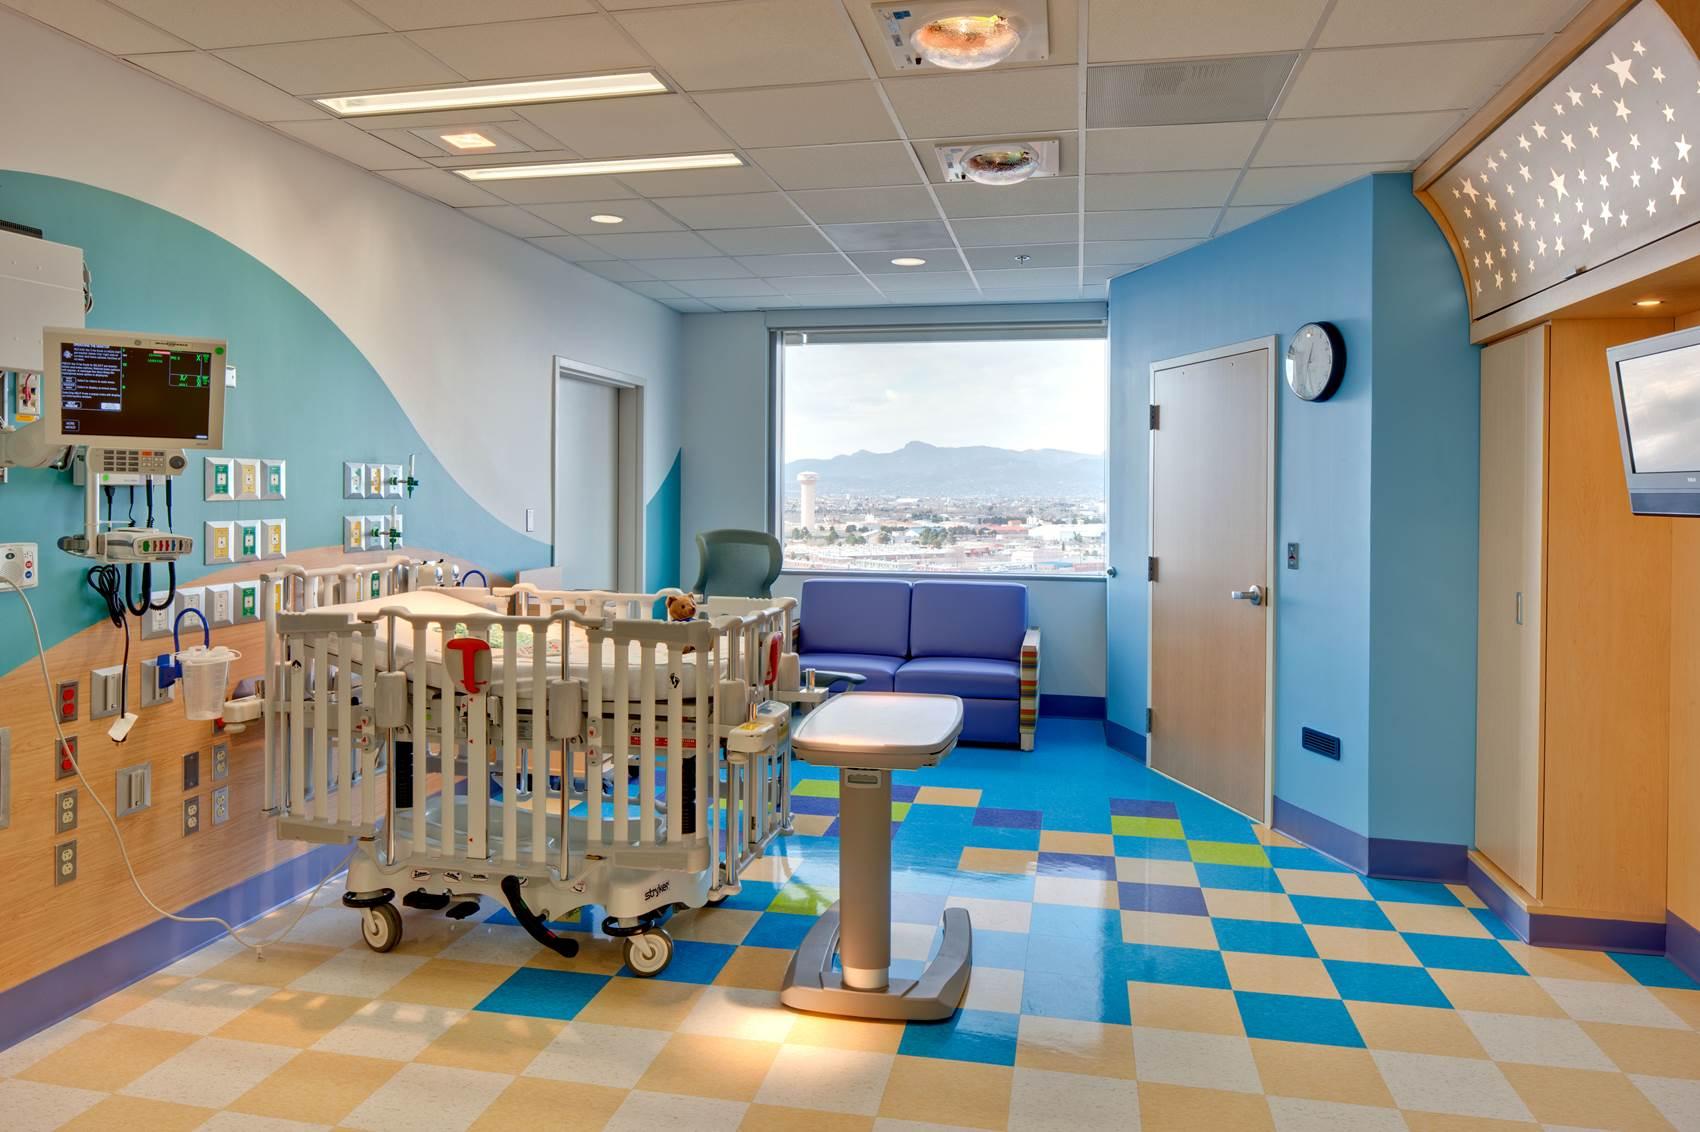 Children's Hospital at University Medical Center of El Paso